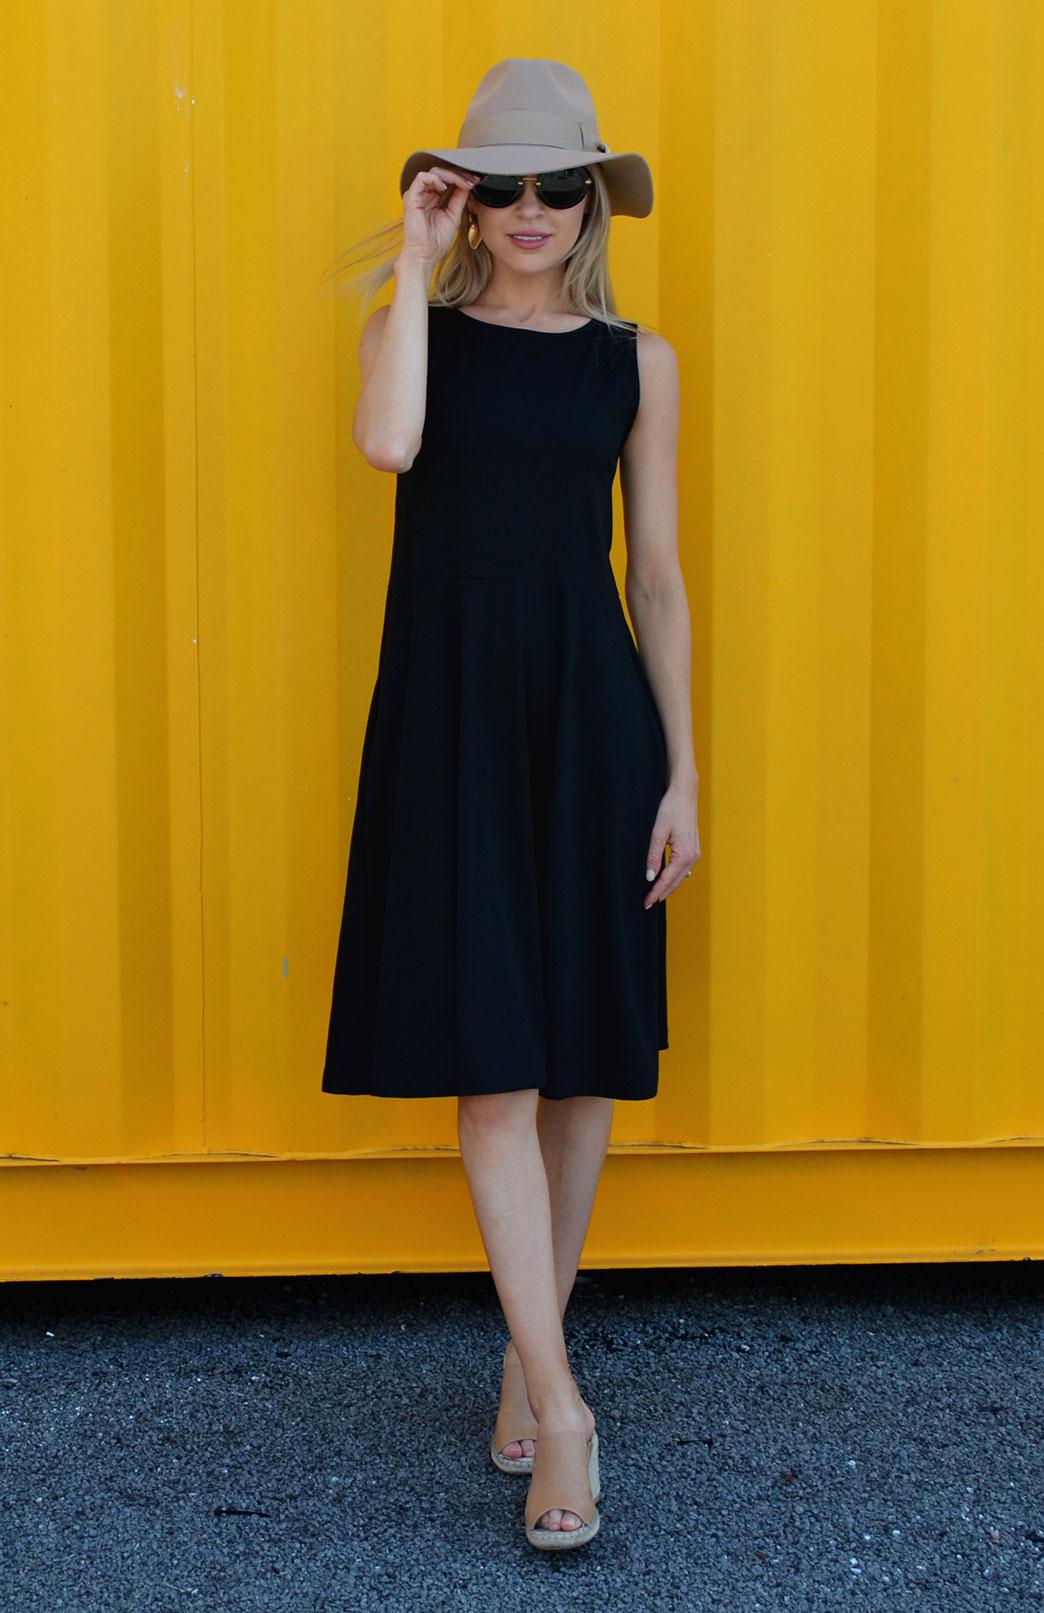 2aa43c186e3a6 MaryAnn Fit and Flare Dress - Women s Black Merino Wool Sleeveless Dress  with Pockets - Smitten. Enlarge